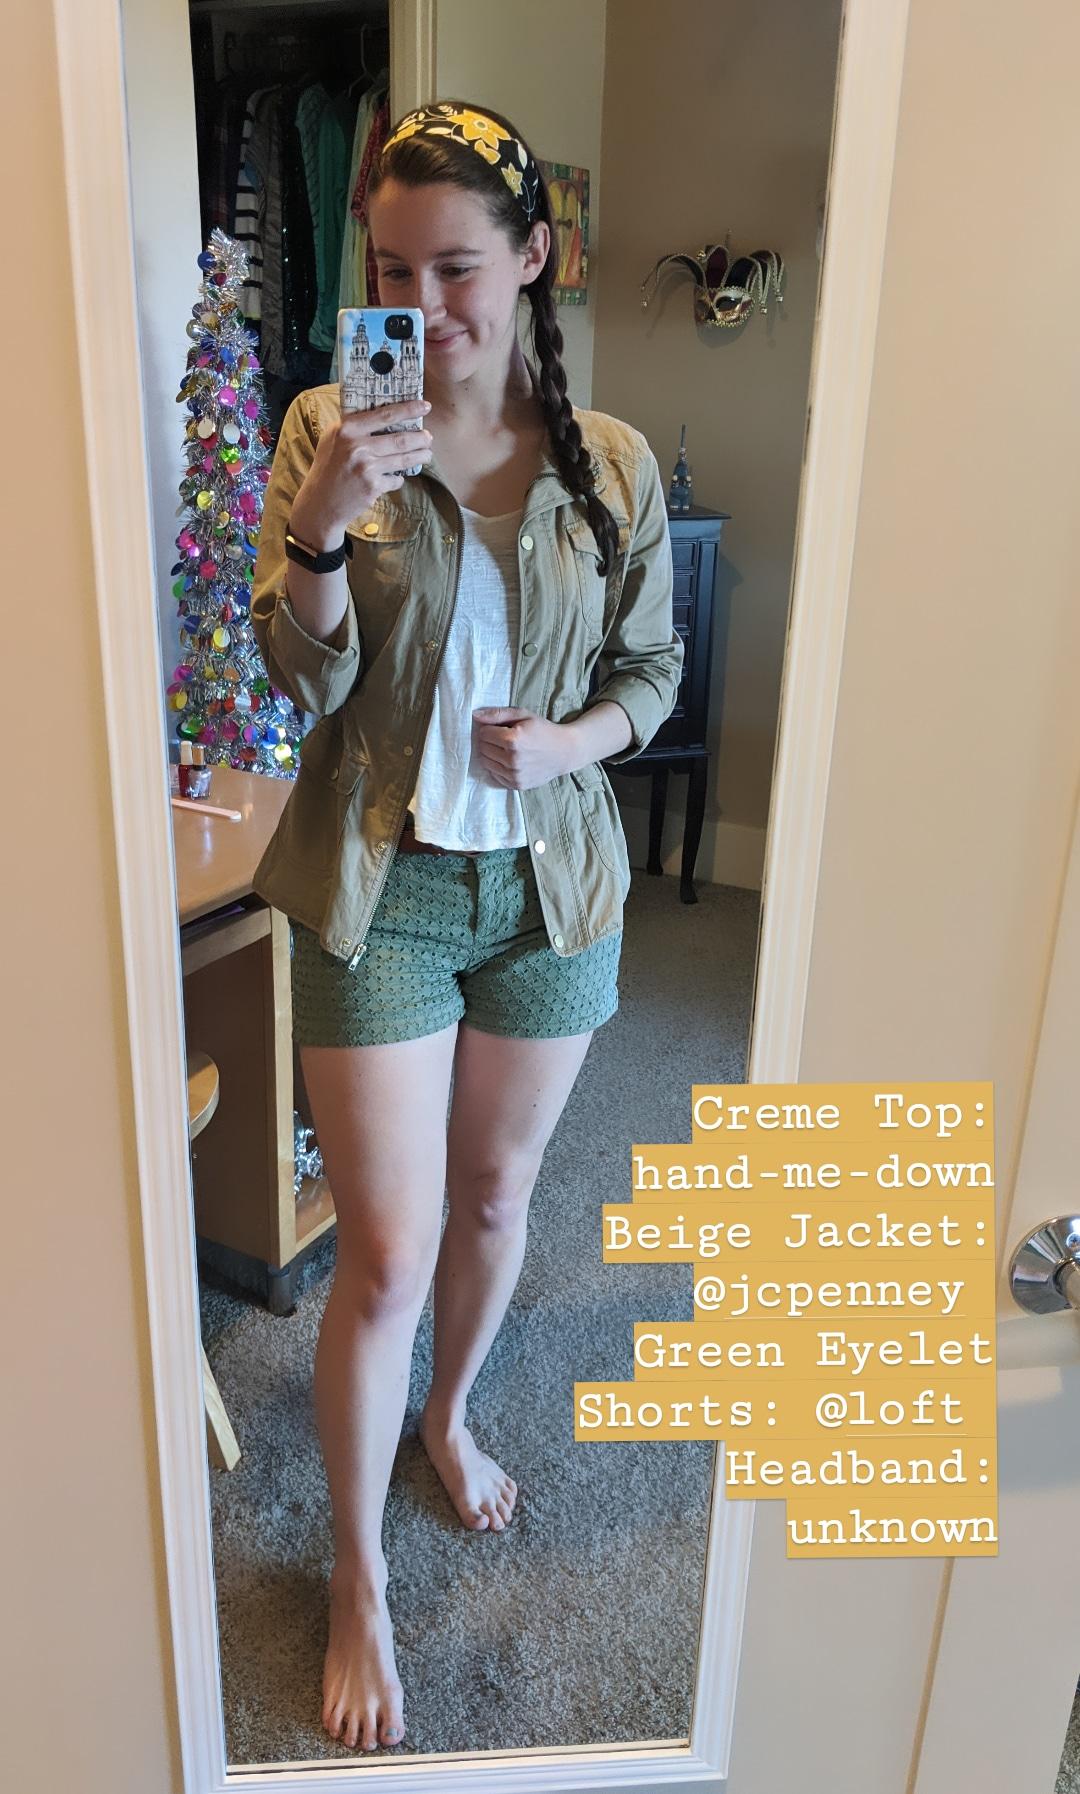 beige jacket, green eyelet shorts, Loft shorts, headbands